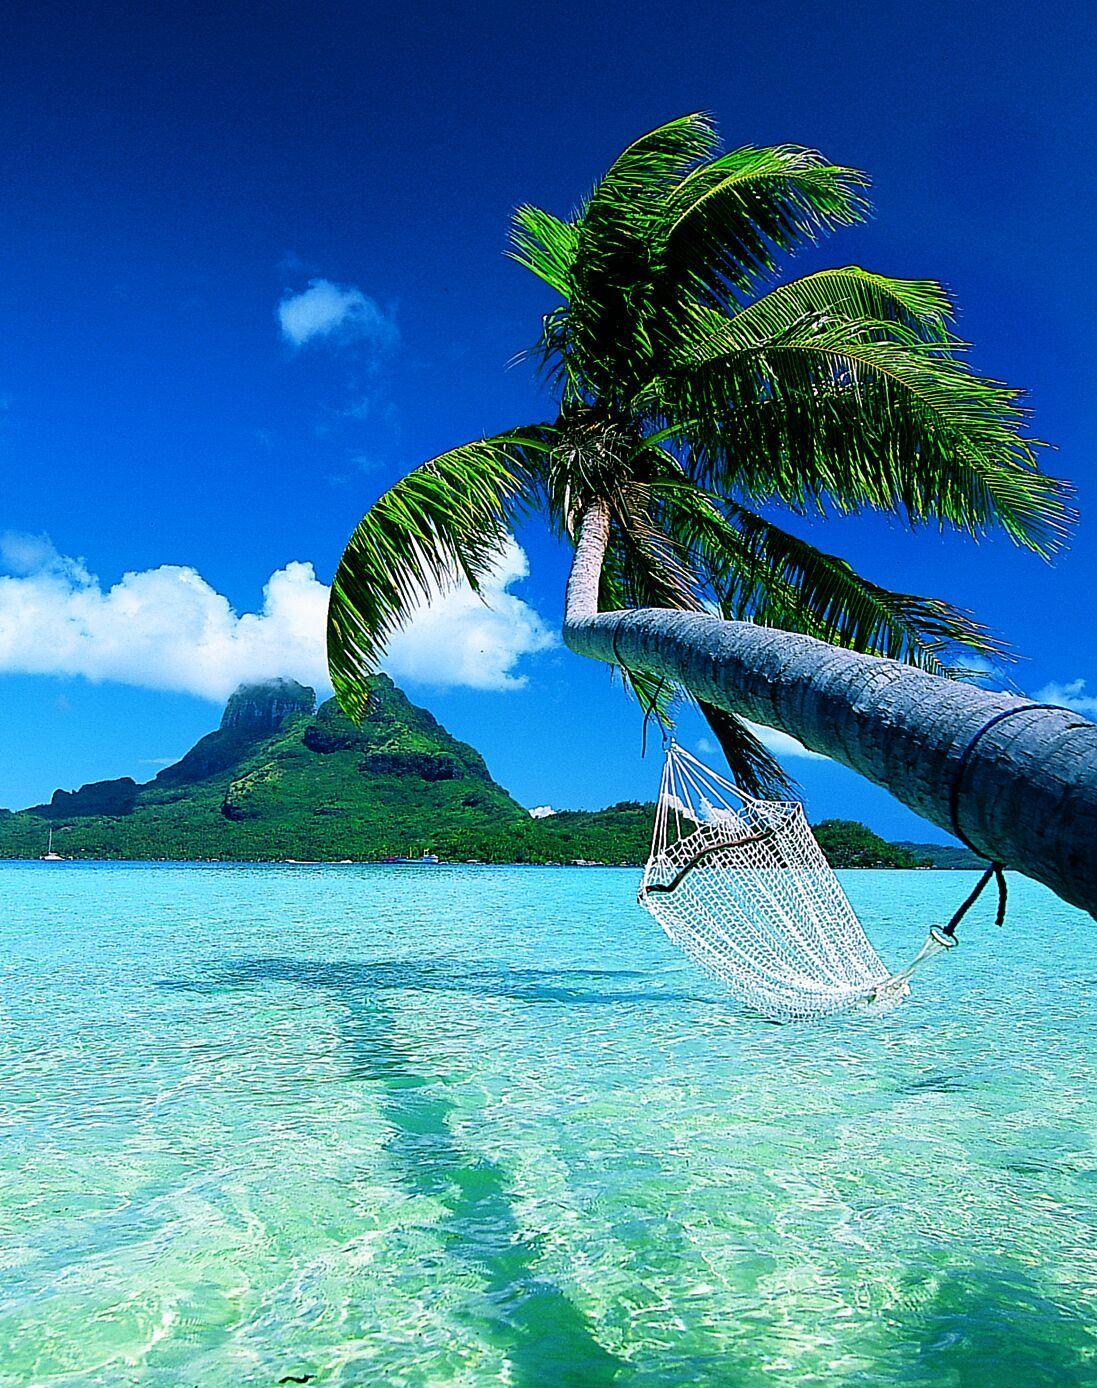 Bora Bora or anywhere tropical!